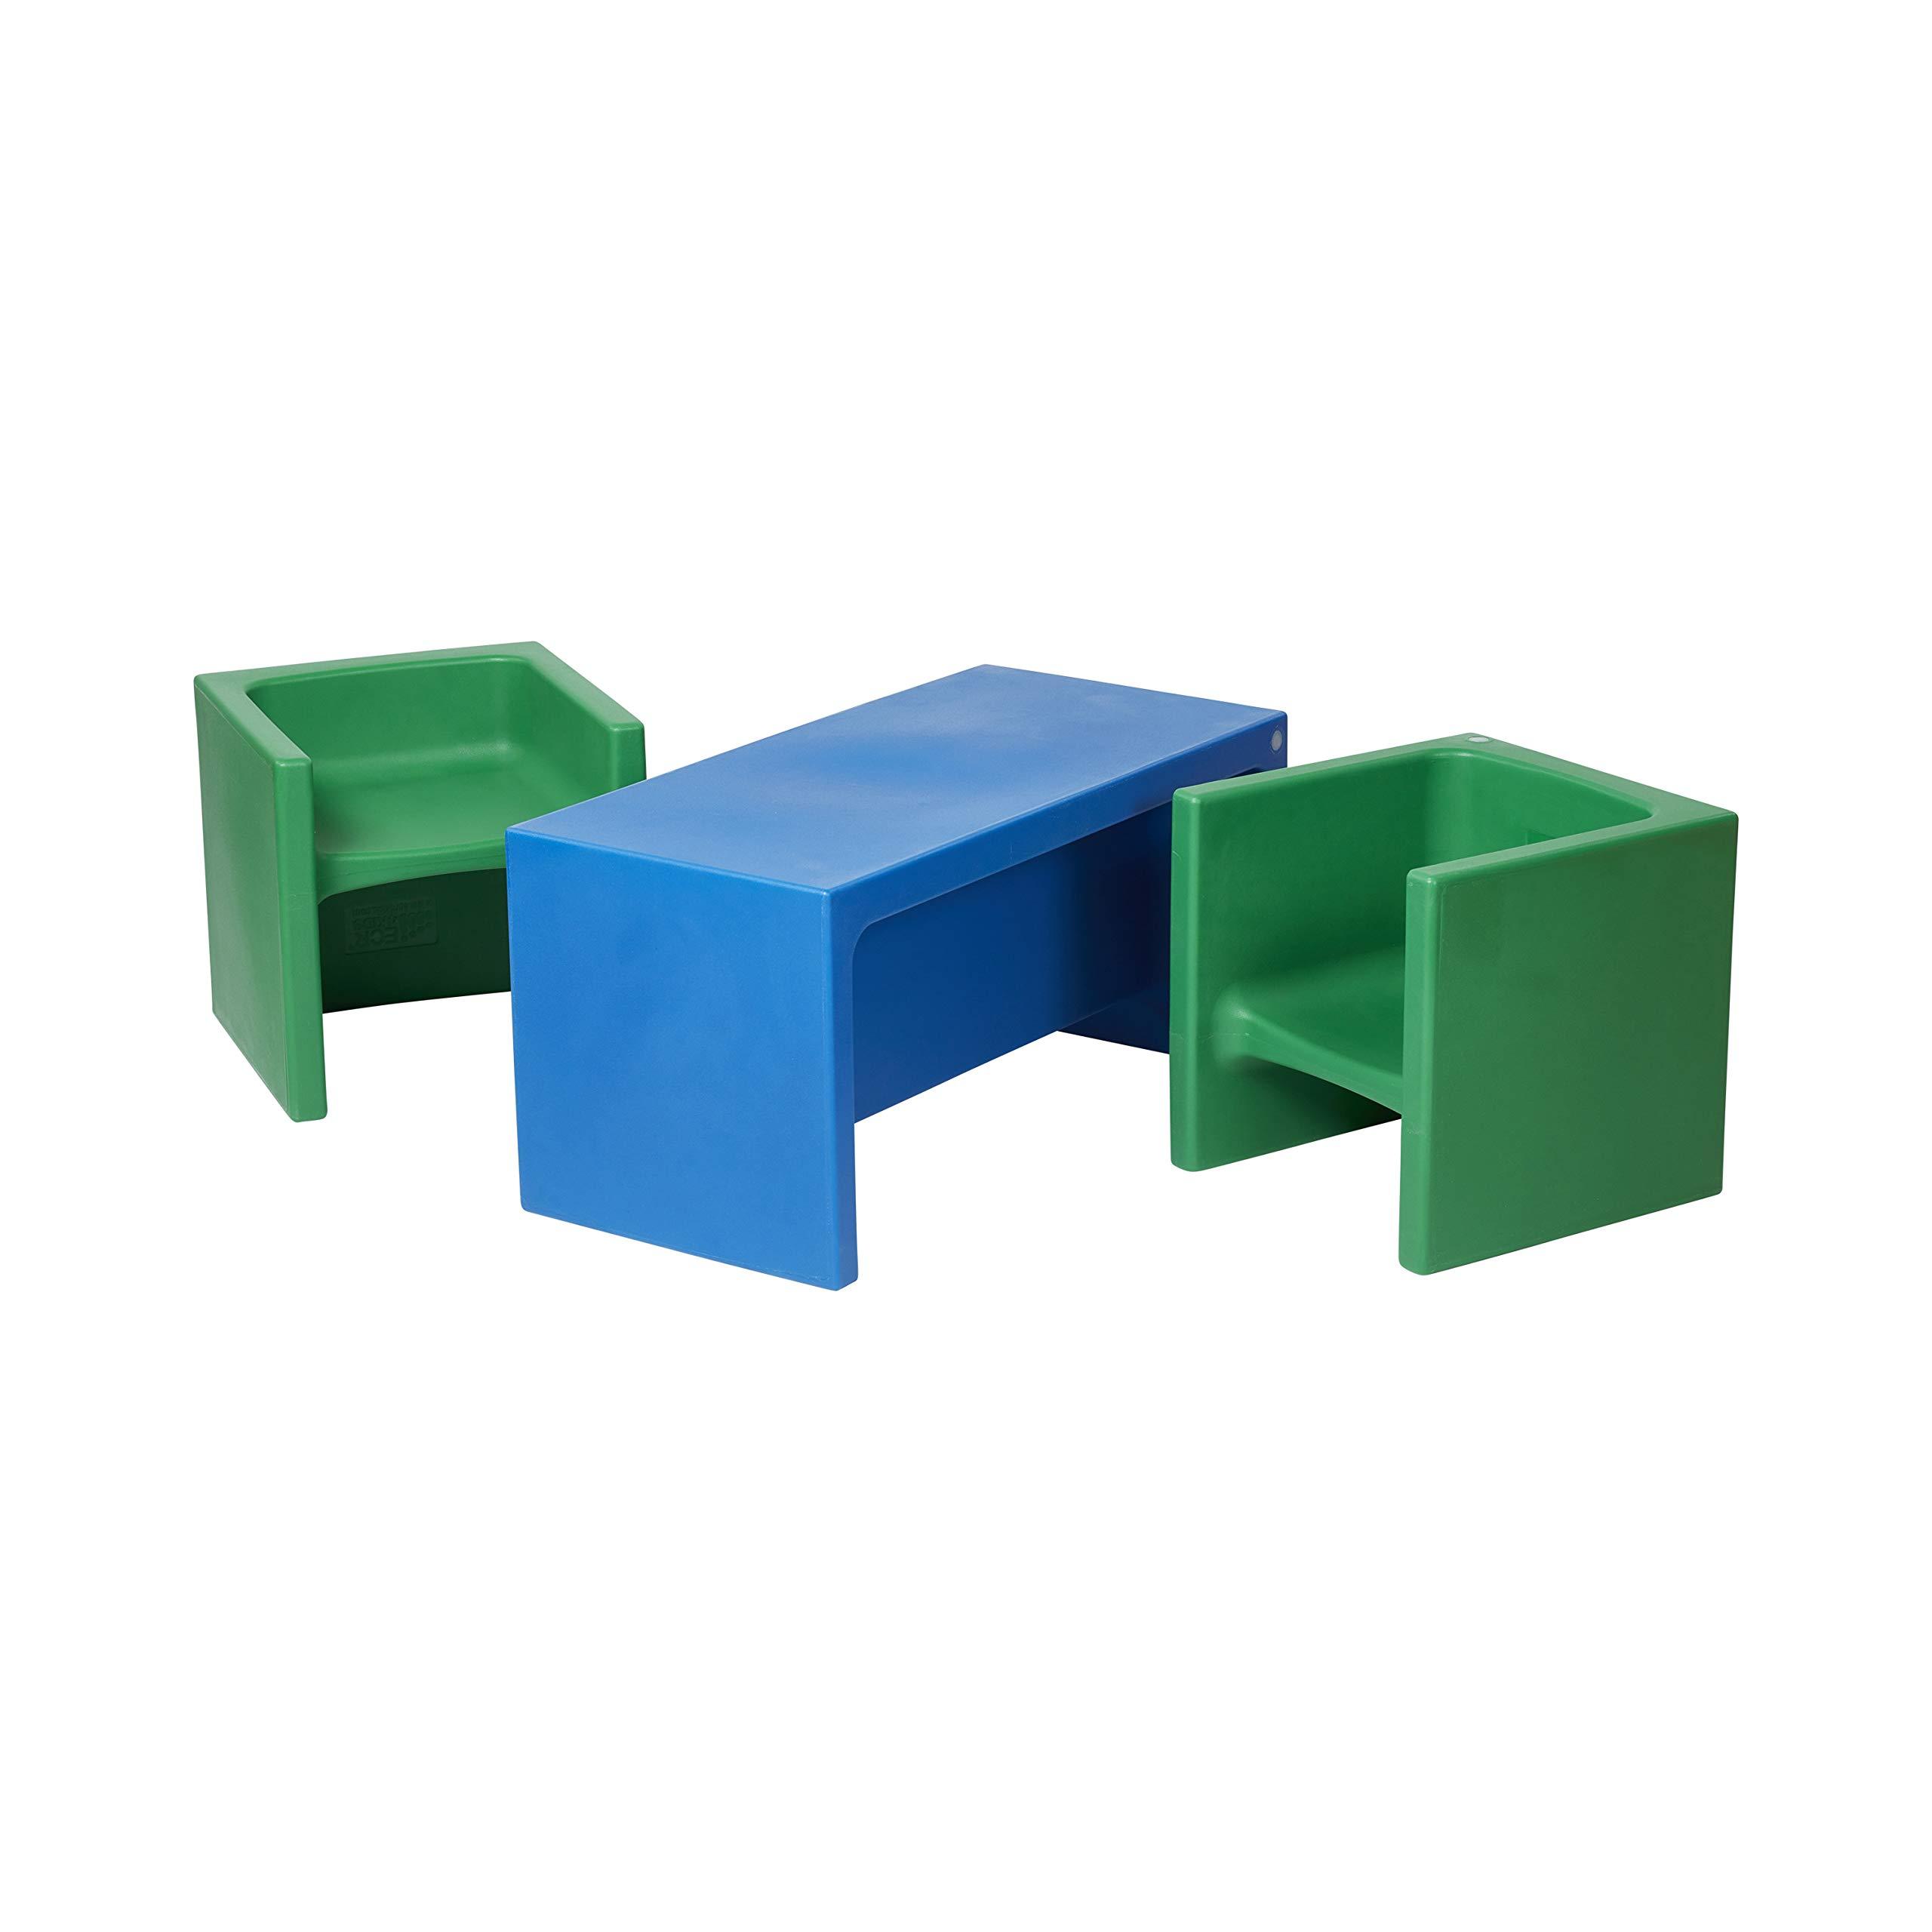 ECR4Kids Tri-MeAdaptable Kids Bench & Chairs Set, 3-in-1 Multipurpose Indoor & Outdoor Furniture for Children, Blue/Green (3-Piece)